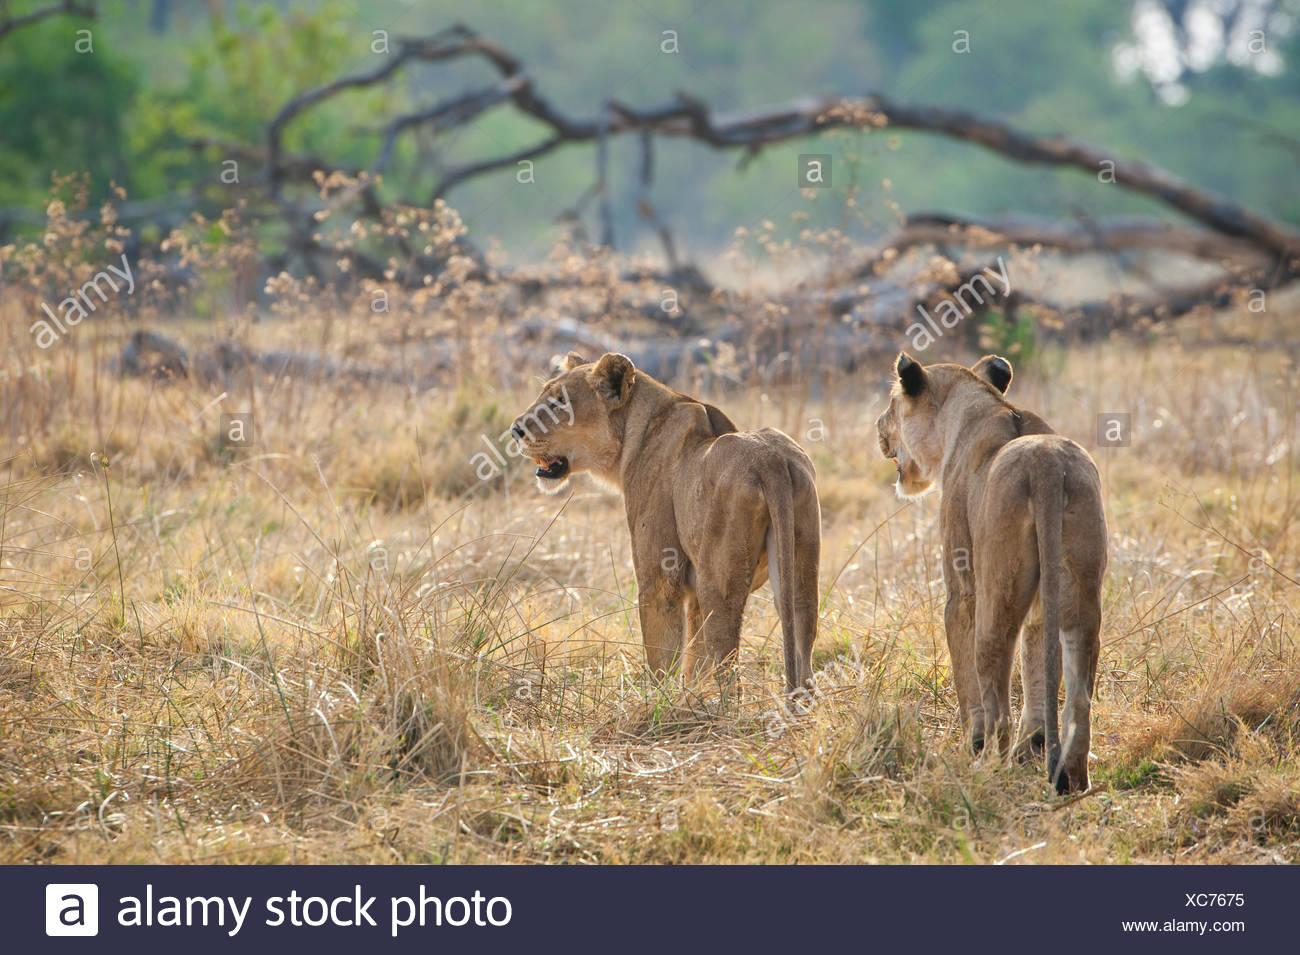 Lion (Panthera leo), two lionesses roam their territory, Kasane, Chobe National Park, Botswana - Stock Image